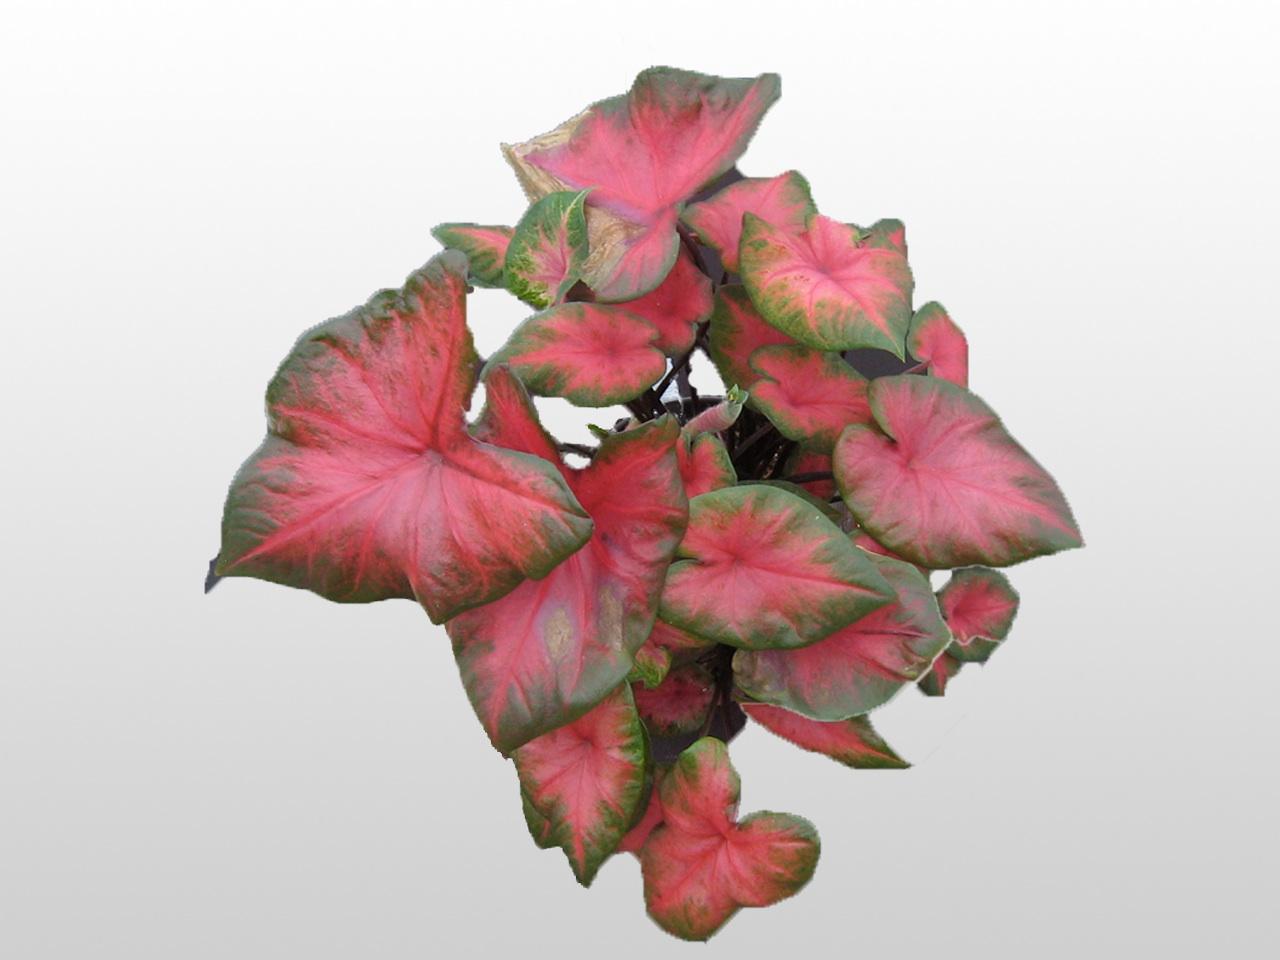 Pink and green Caladium Plant